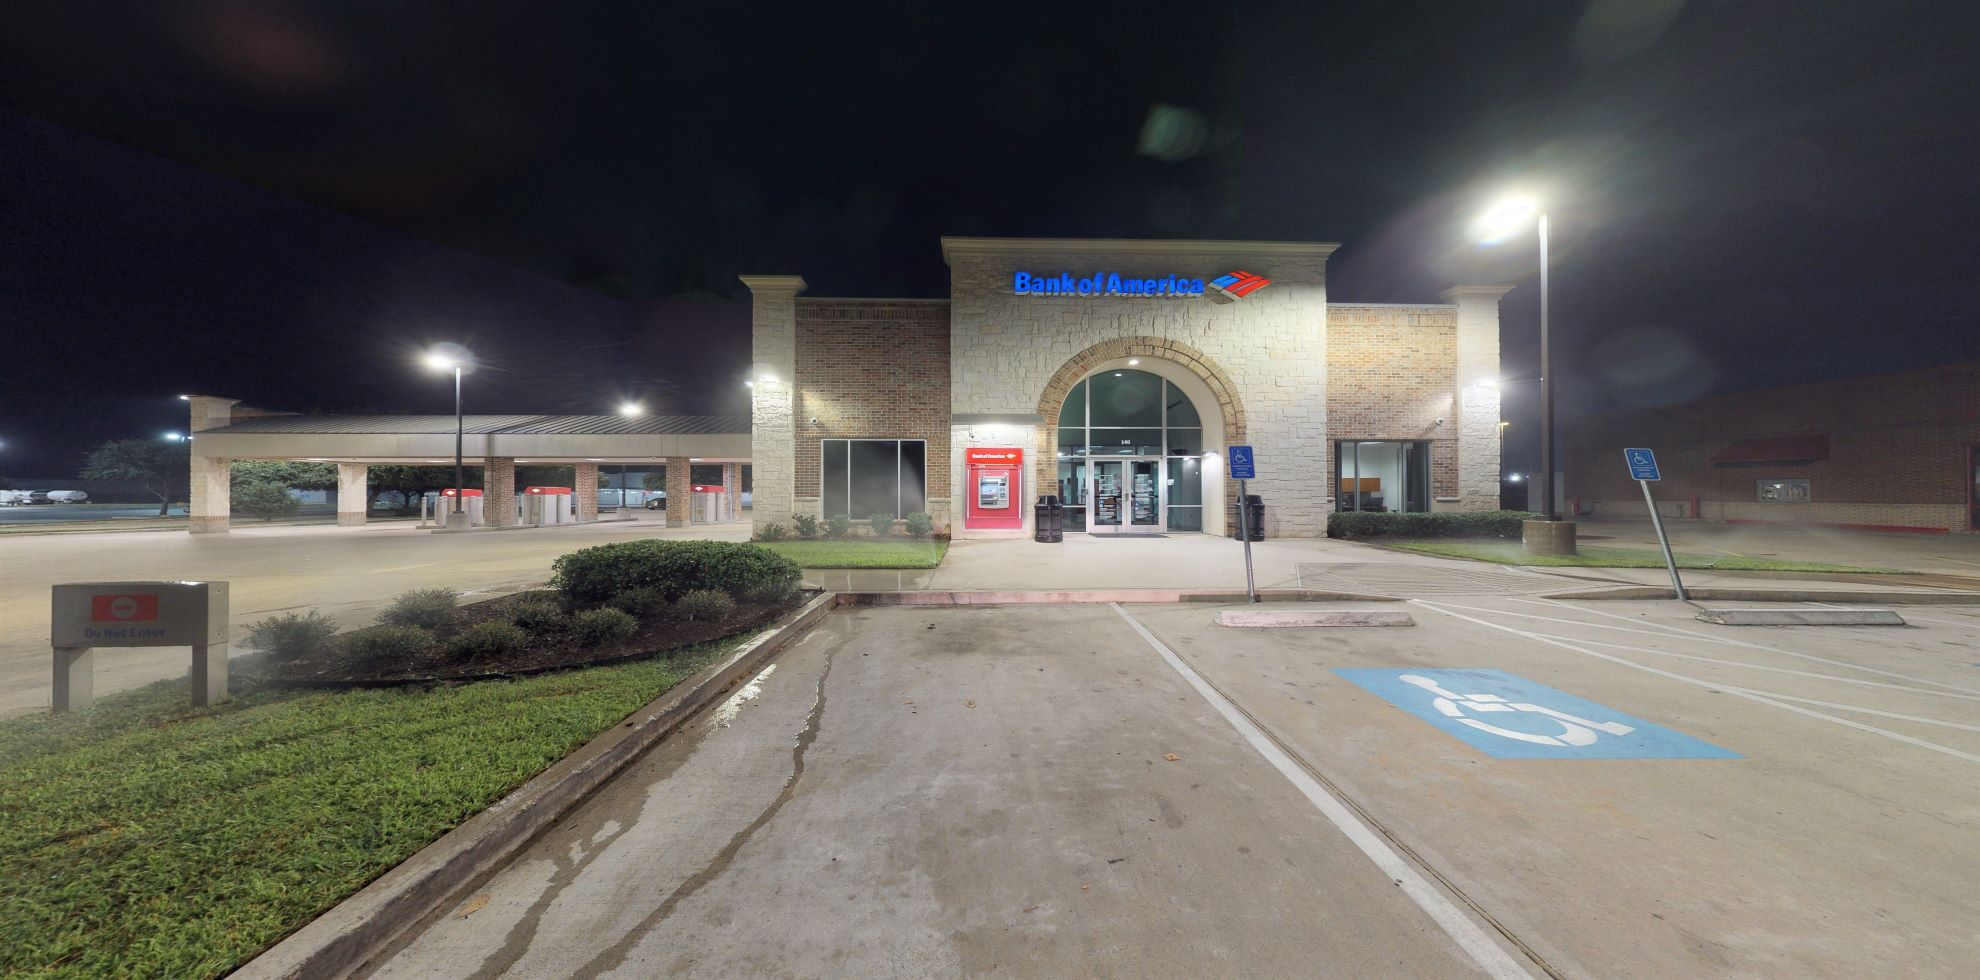 Bank of America financial center with drive-thru ATM   140 E Louetta Rd, Spring, TX 77373